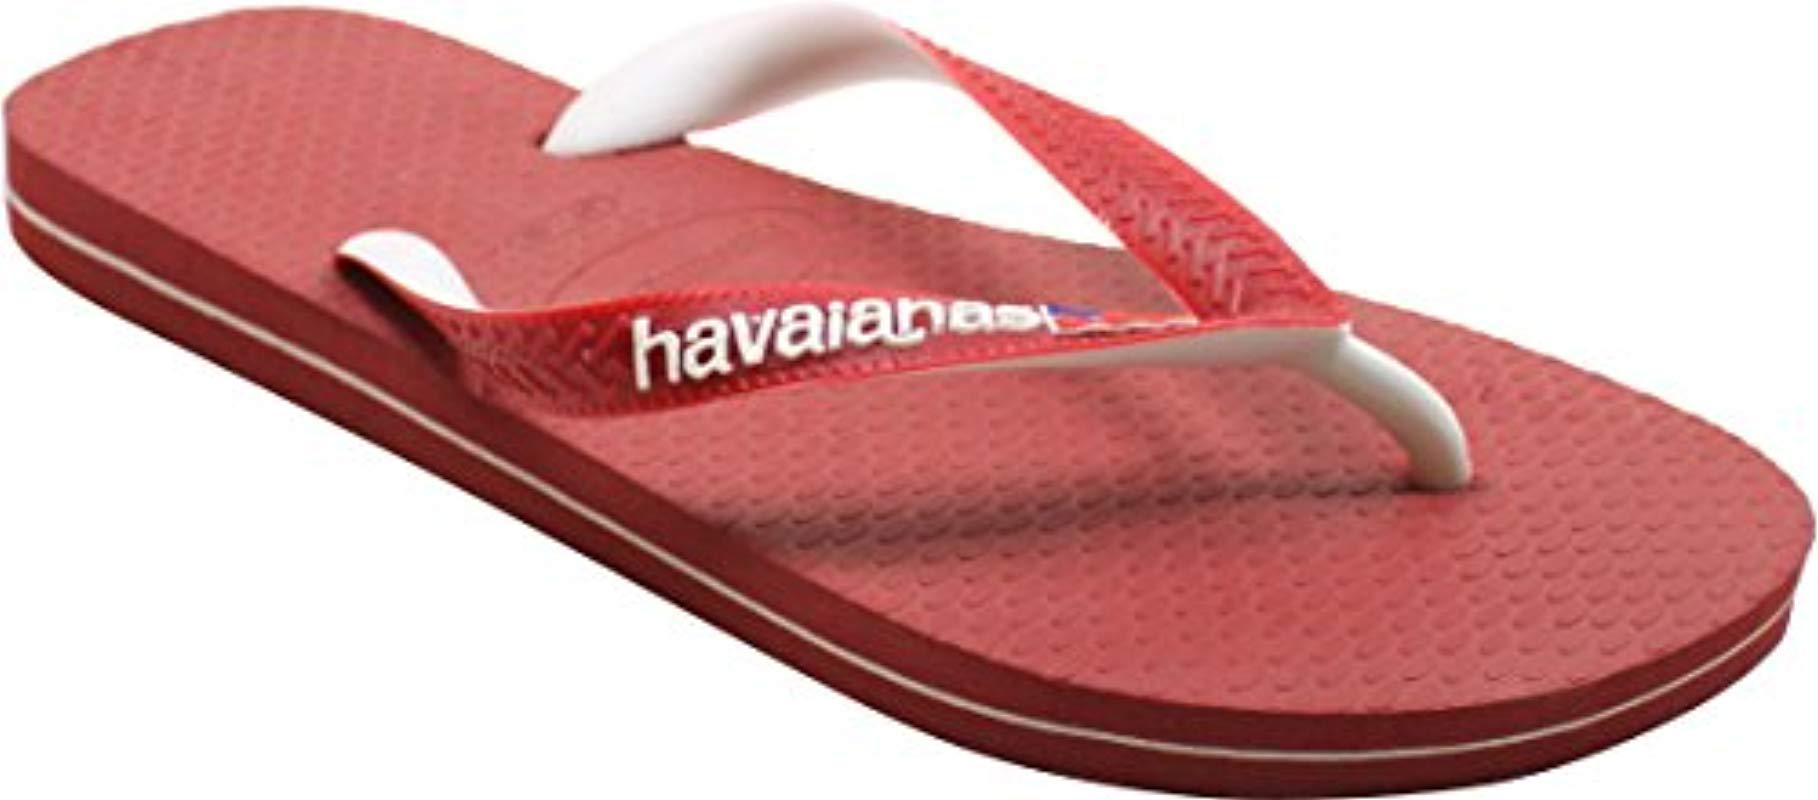 703745162440f Lyst - Havaianas Usa Logo Navy Blue Flip Flop in Red